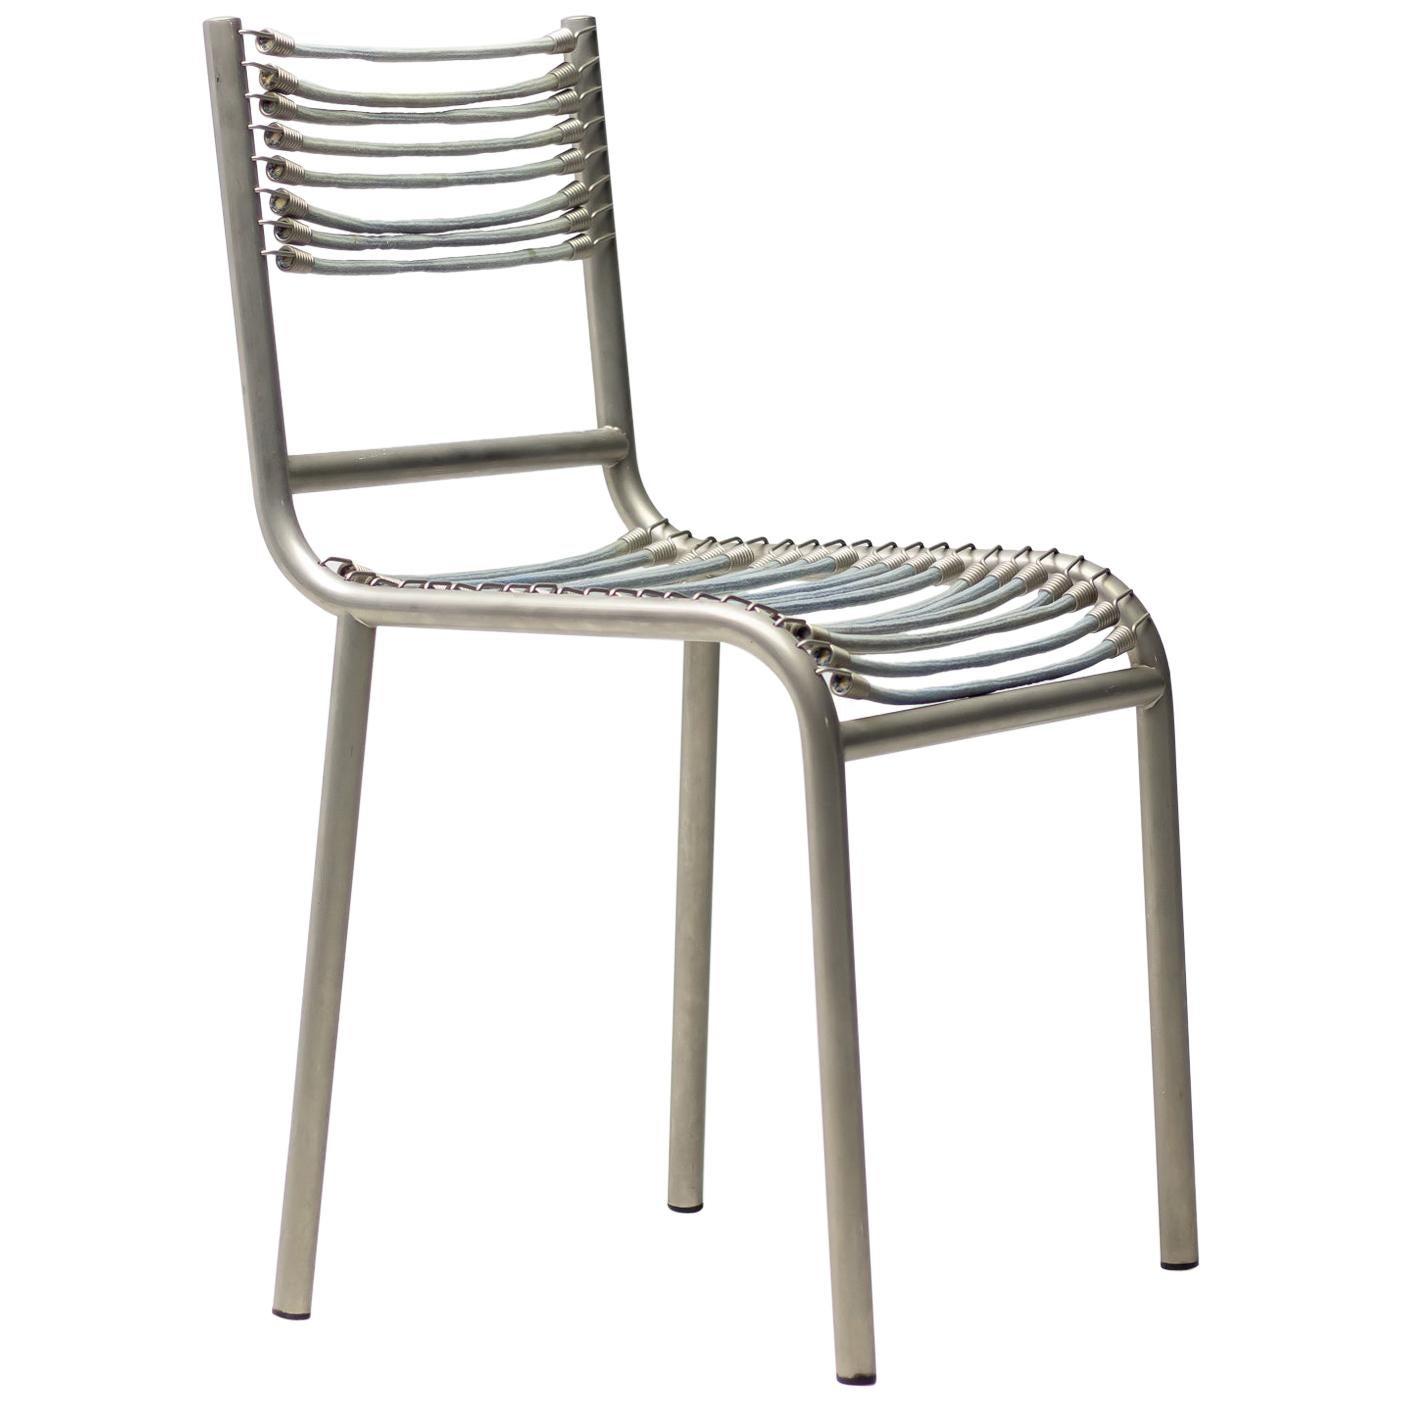 René Herbst Sandows Chair